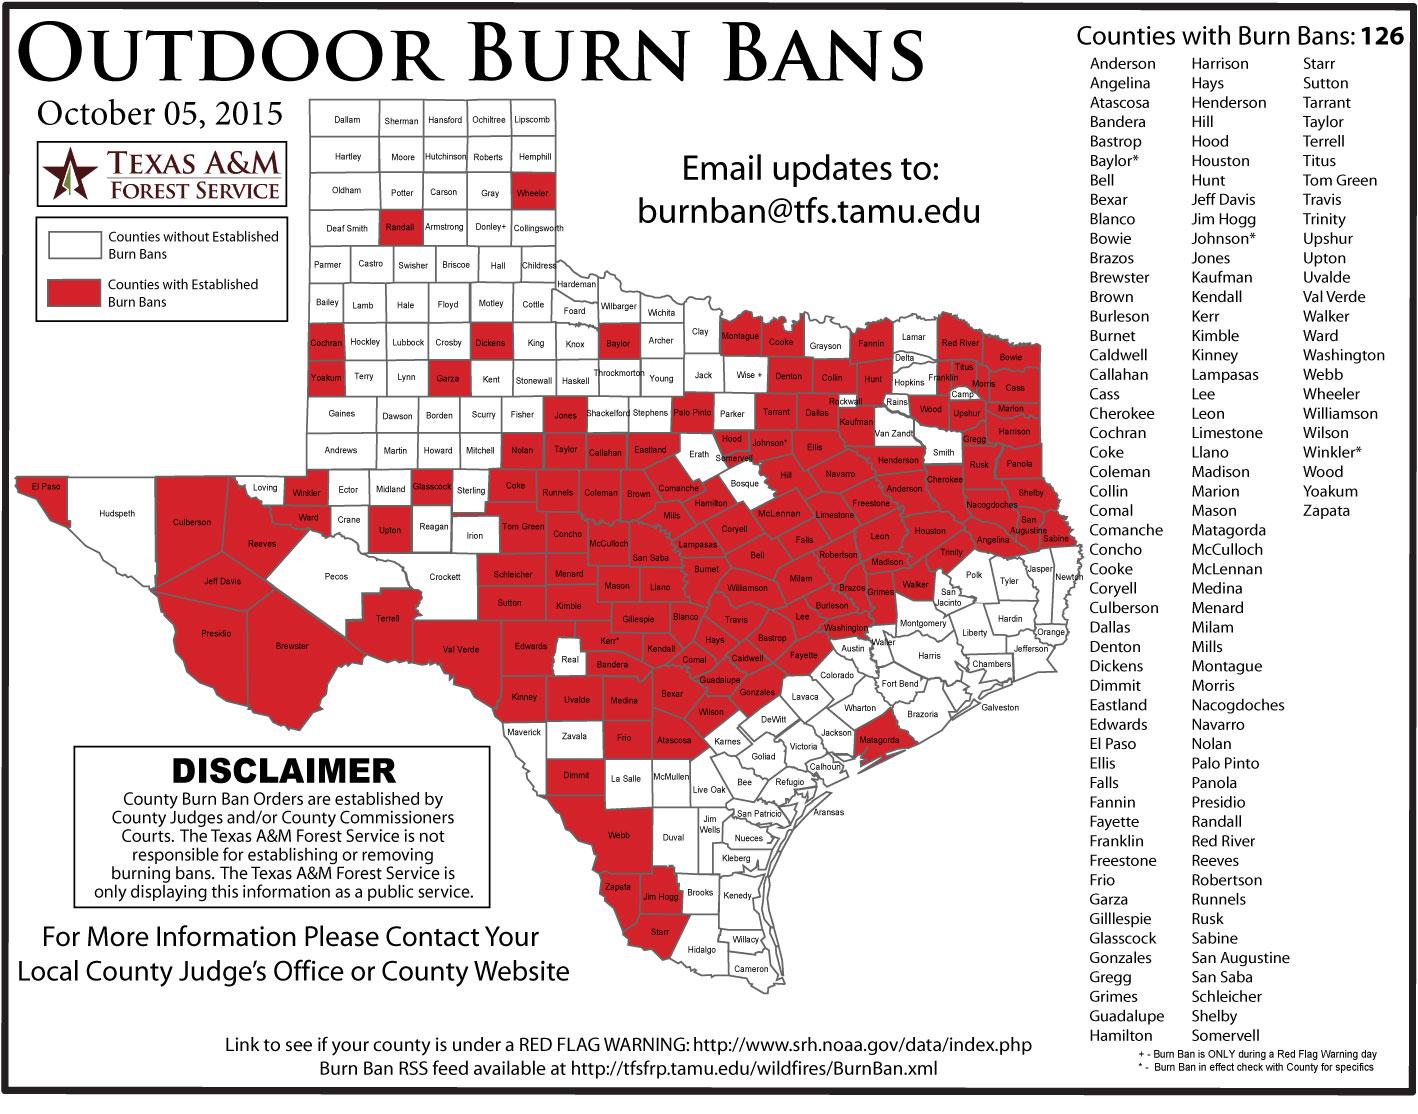 Burn Ban Map Texas | Business Ideas 2013 - Burn Ban Map Of Texas